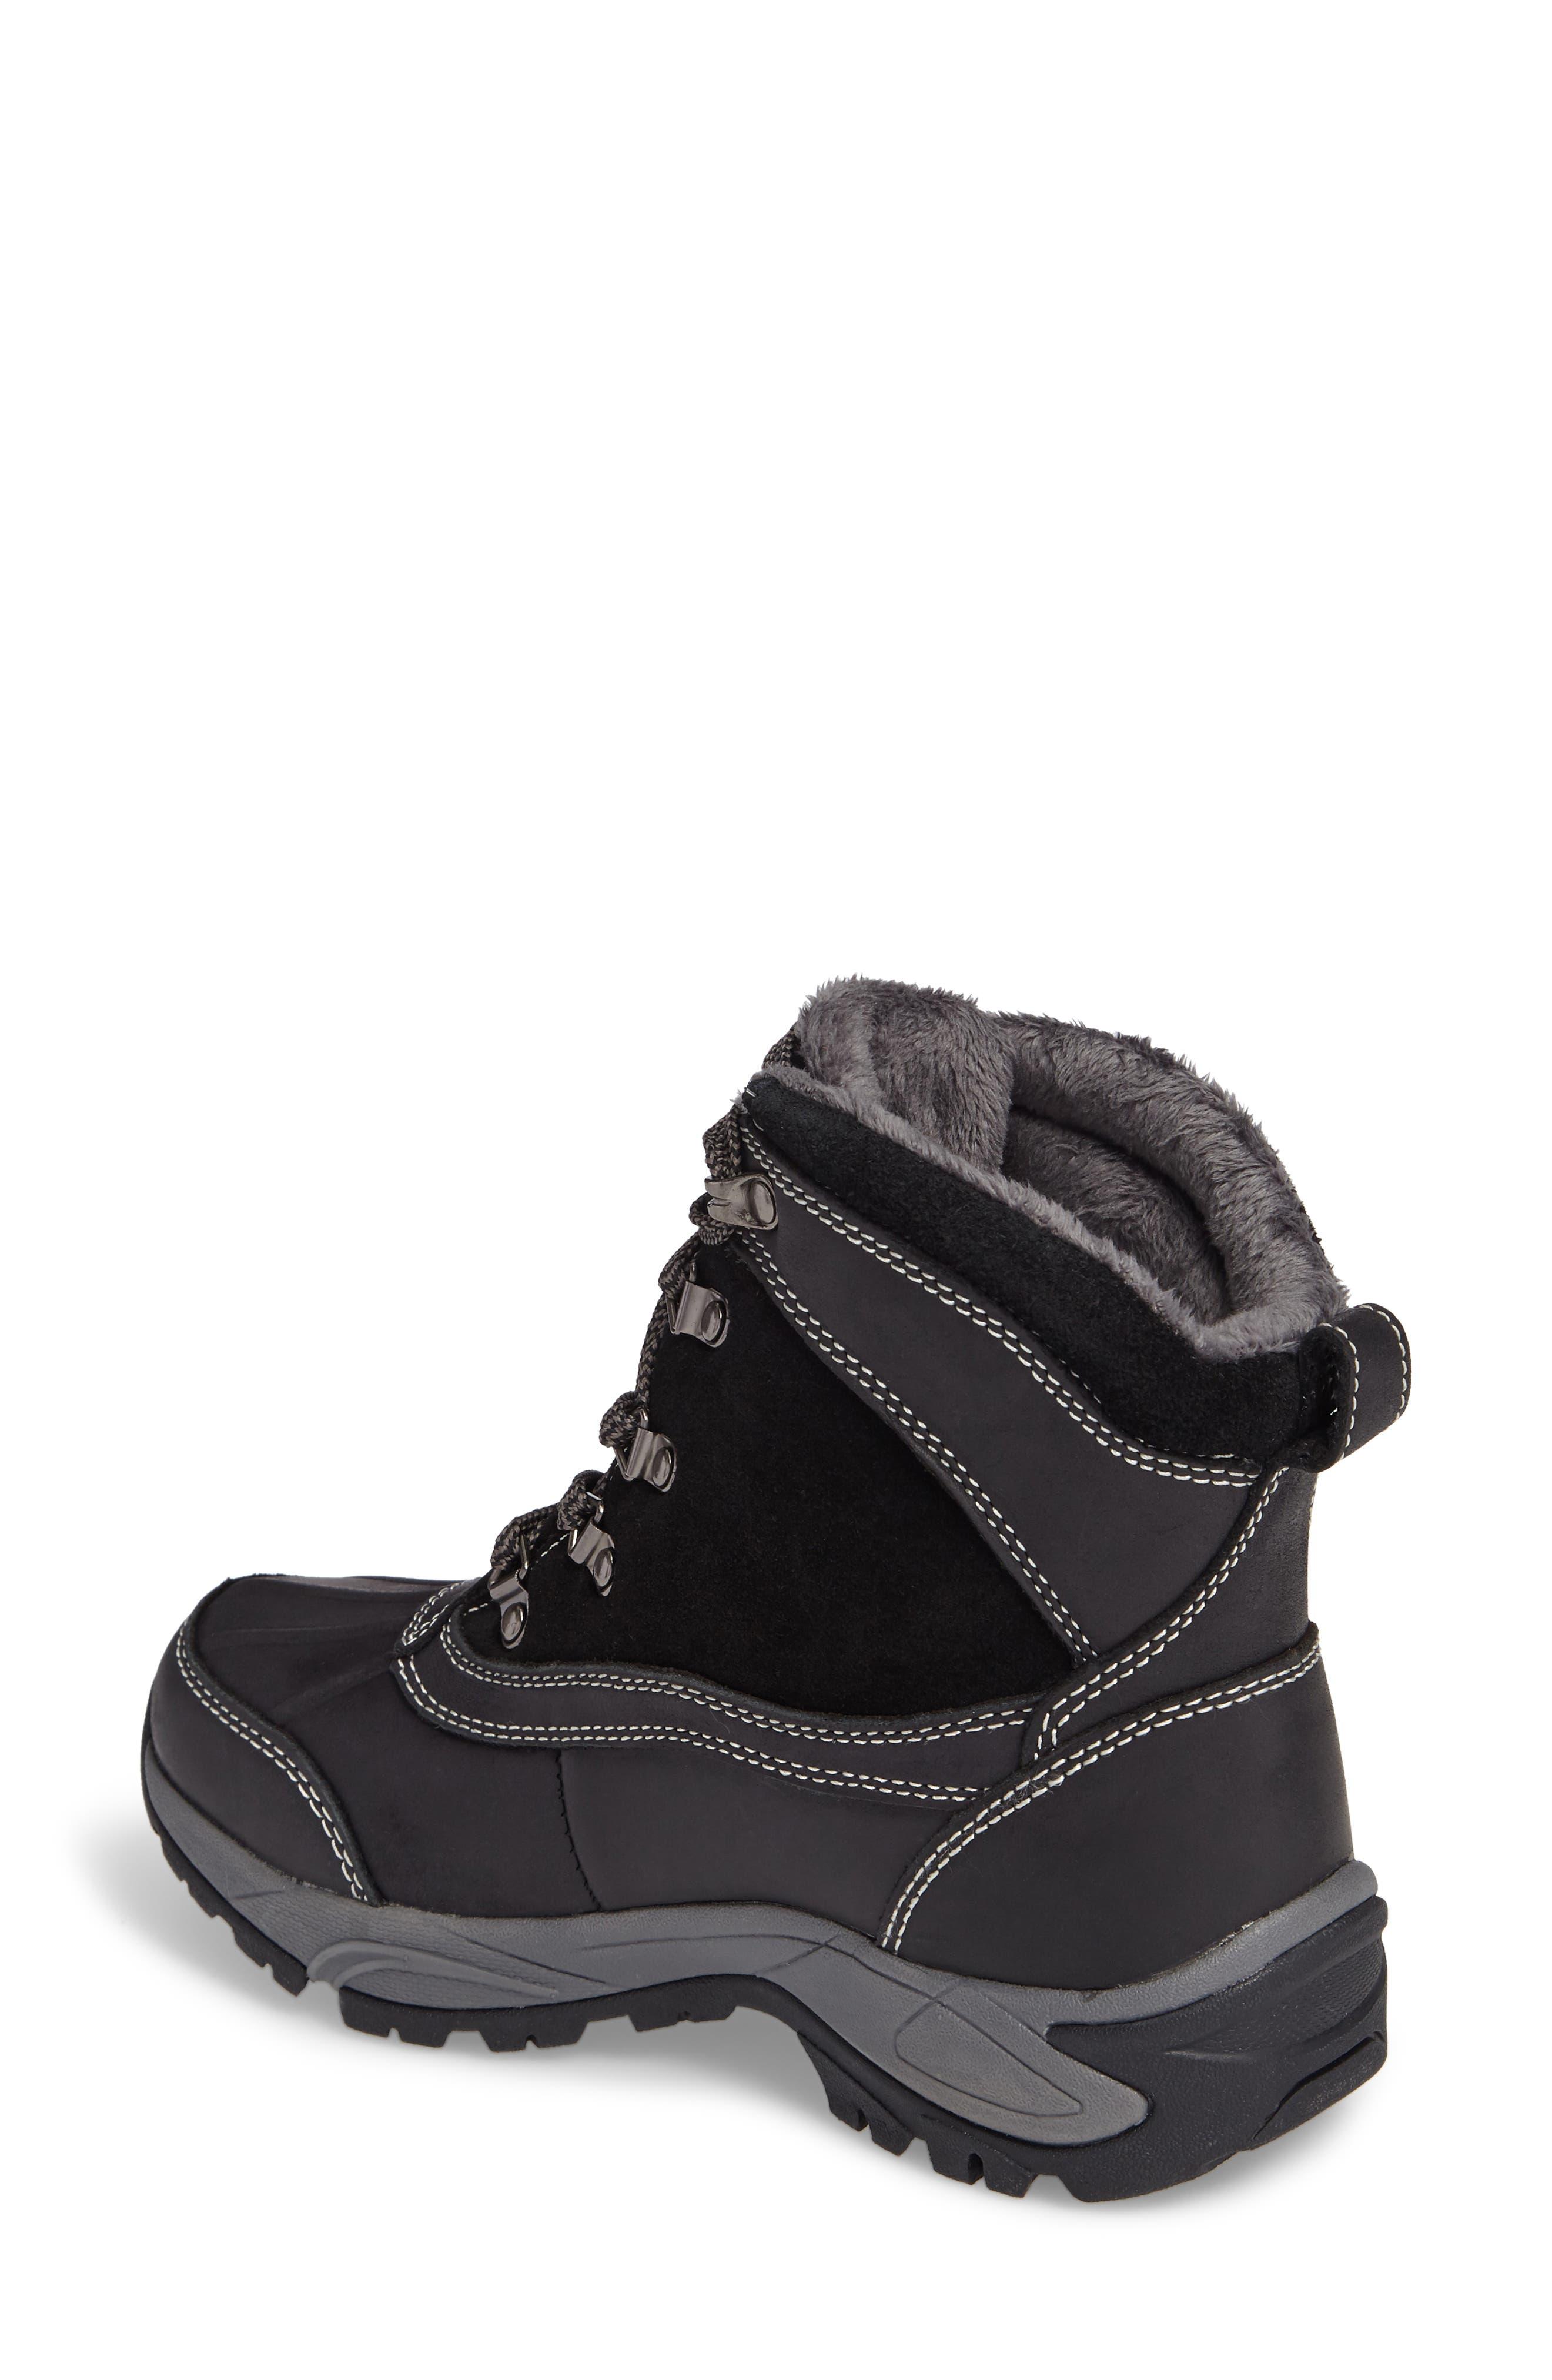 'Renee' Waterproof Insulated Winter Boot,                             Alternate thumbnail 2, color,                             001